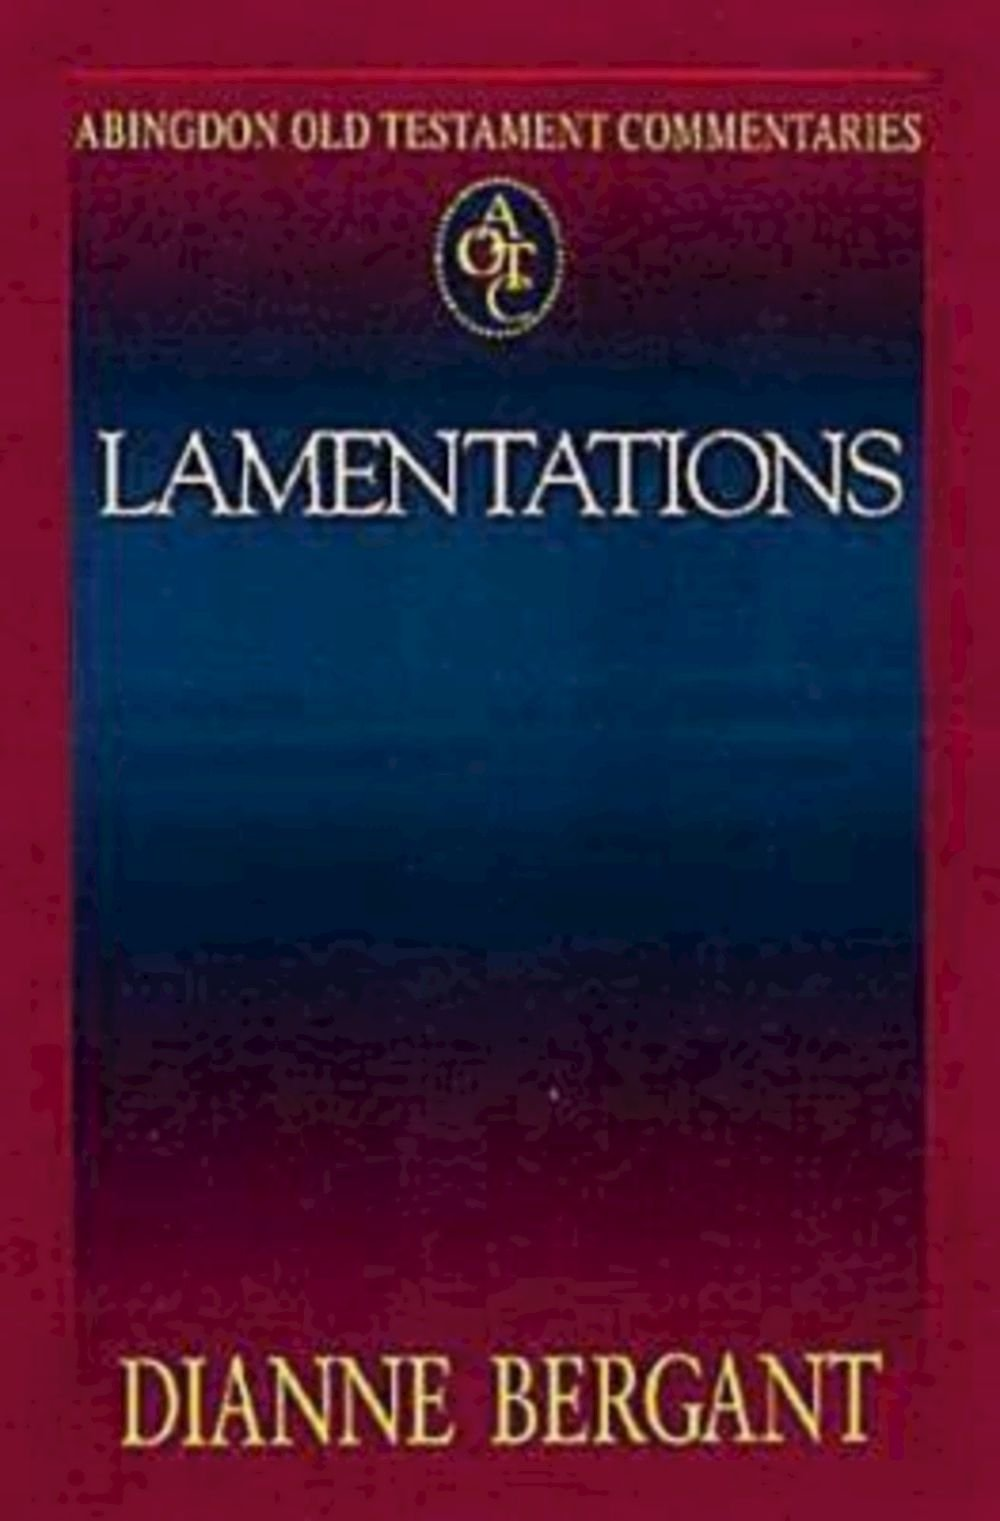 Abingdon old testament commentaries lamentations dianne bergant 9780687084616 amazon com books